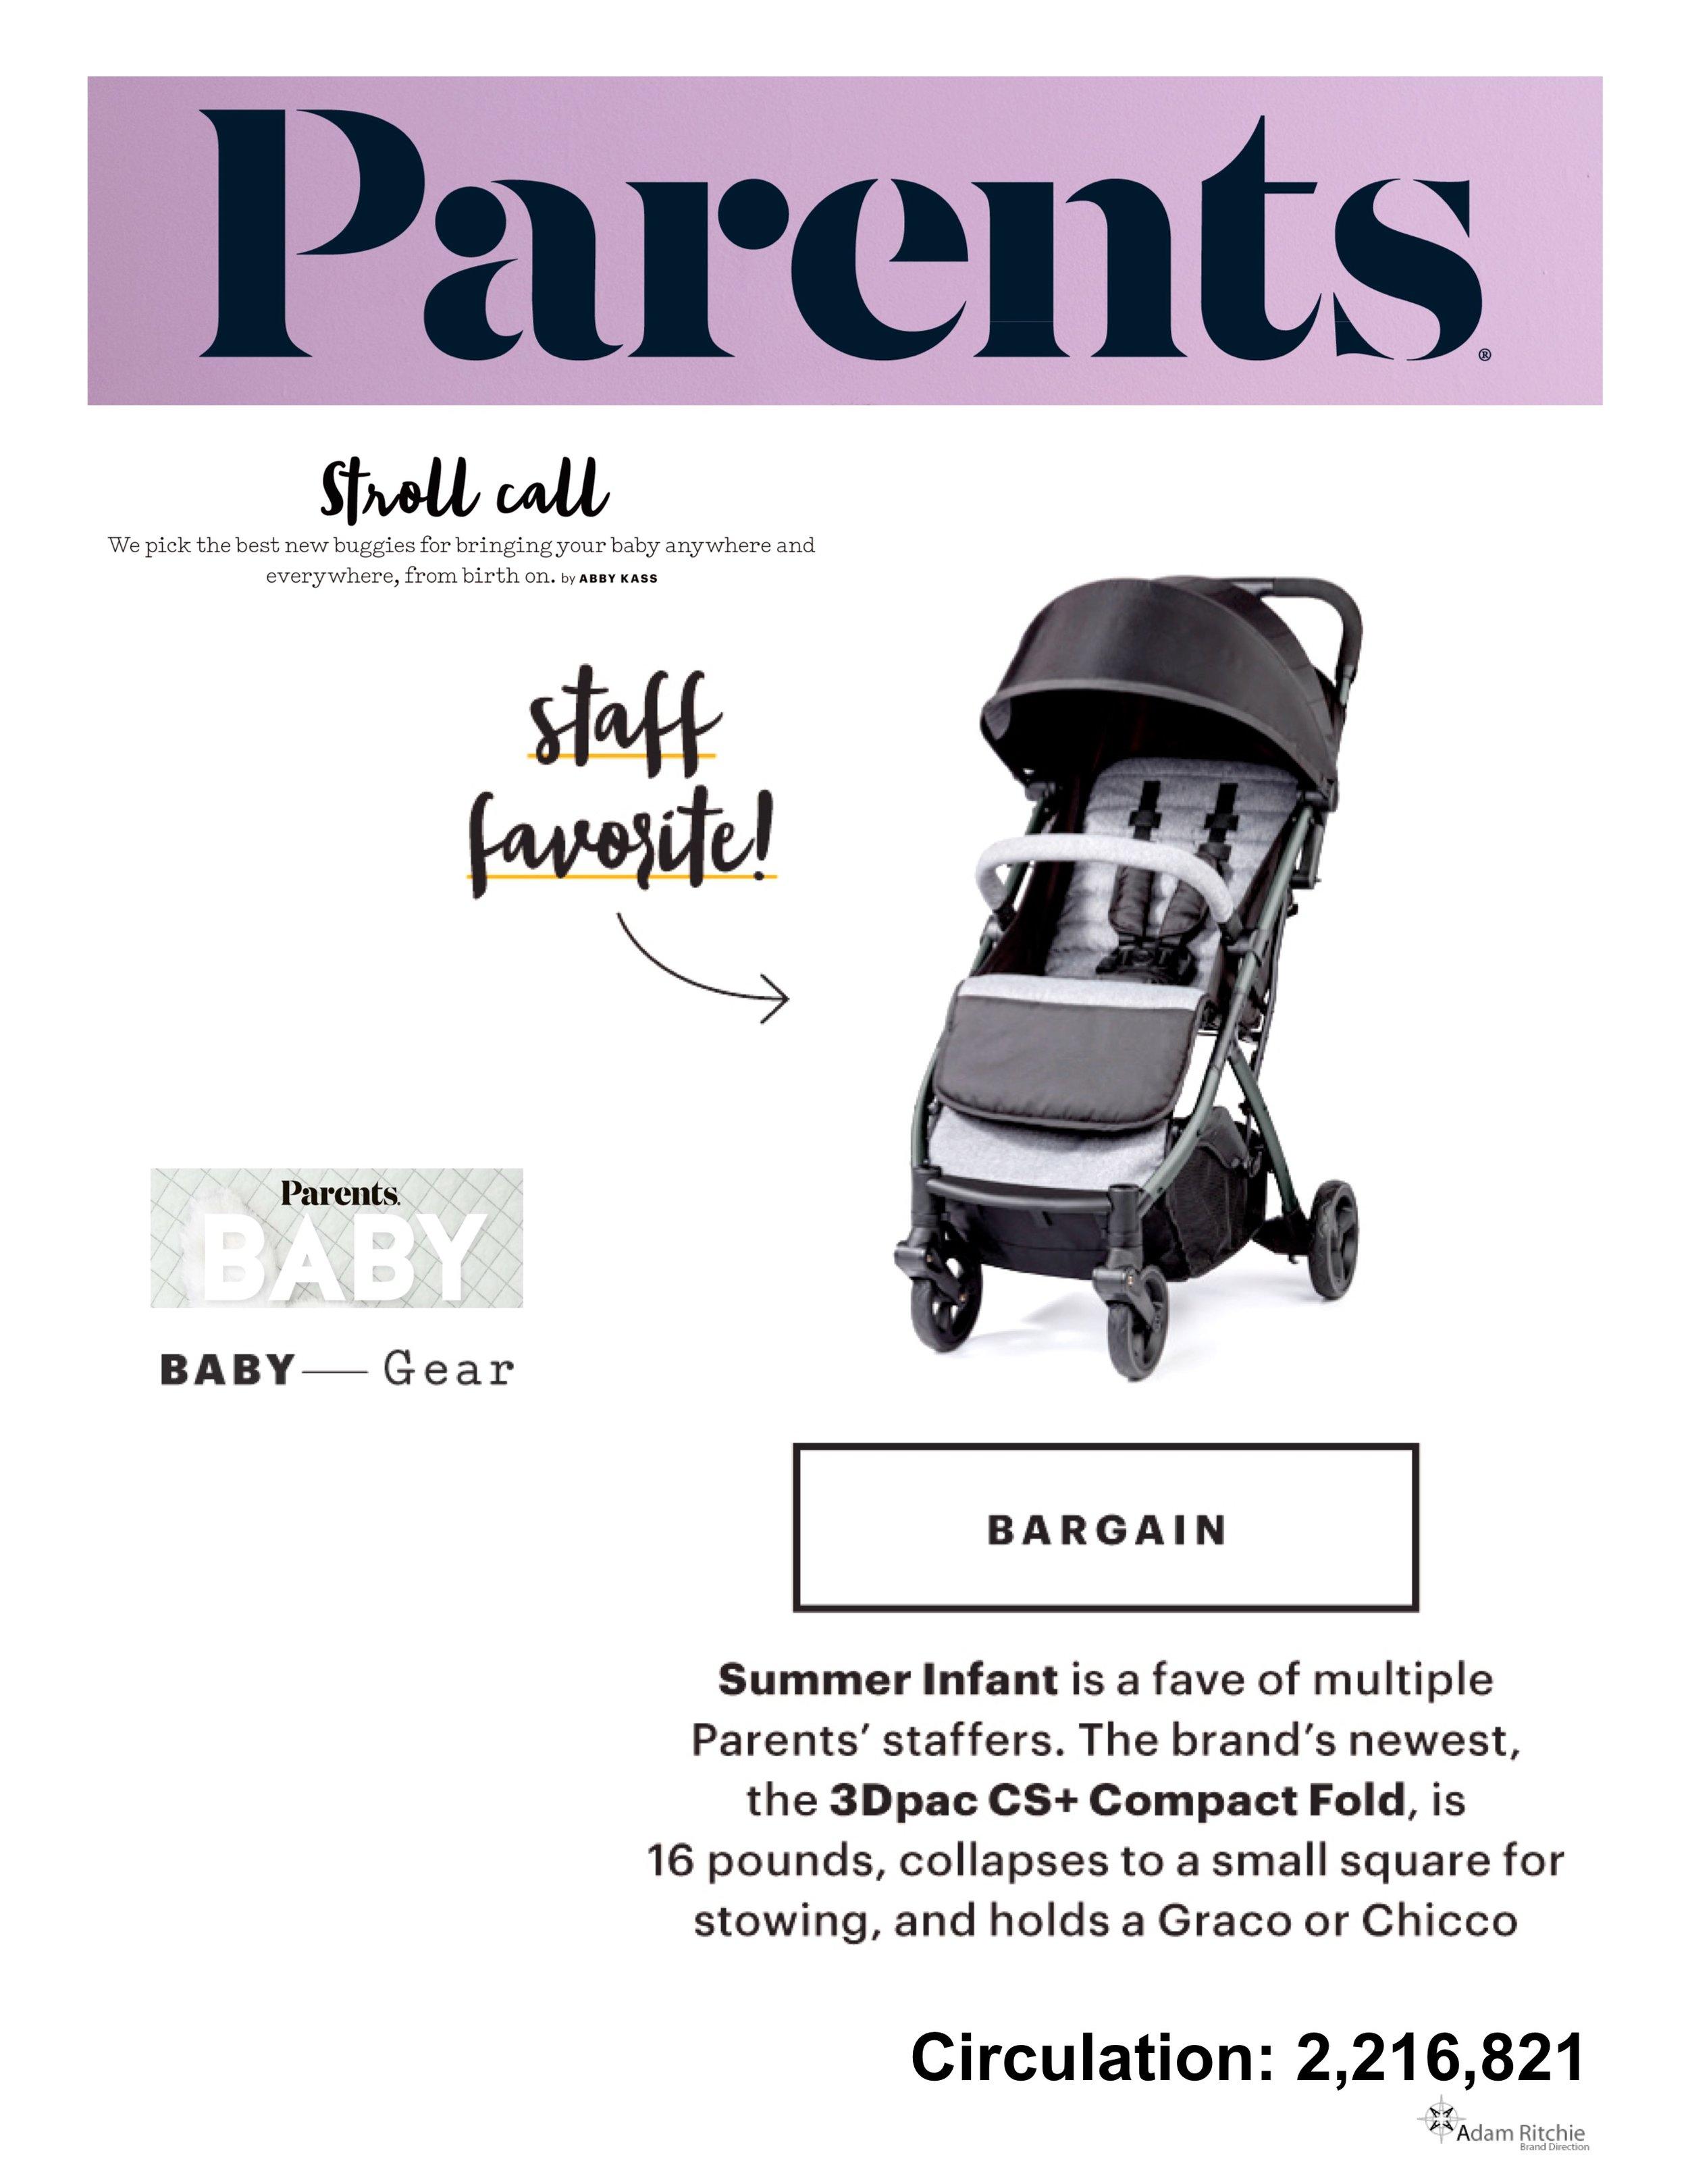 2018.05.00_Parents Baby_Summer Infant 3Dpac CS+.jpeg